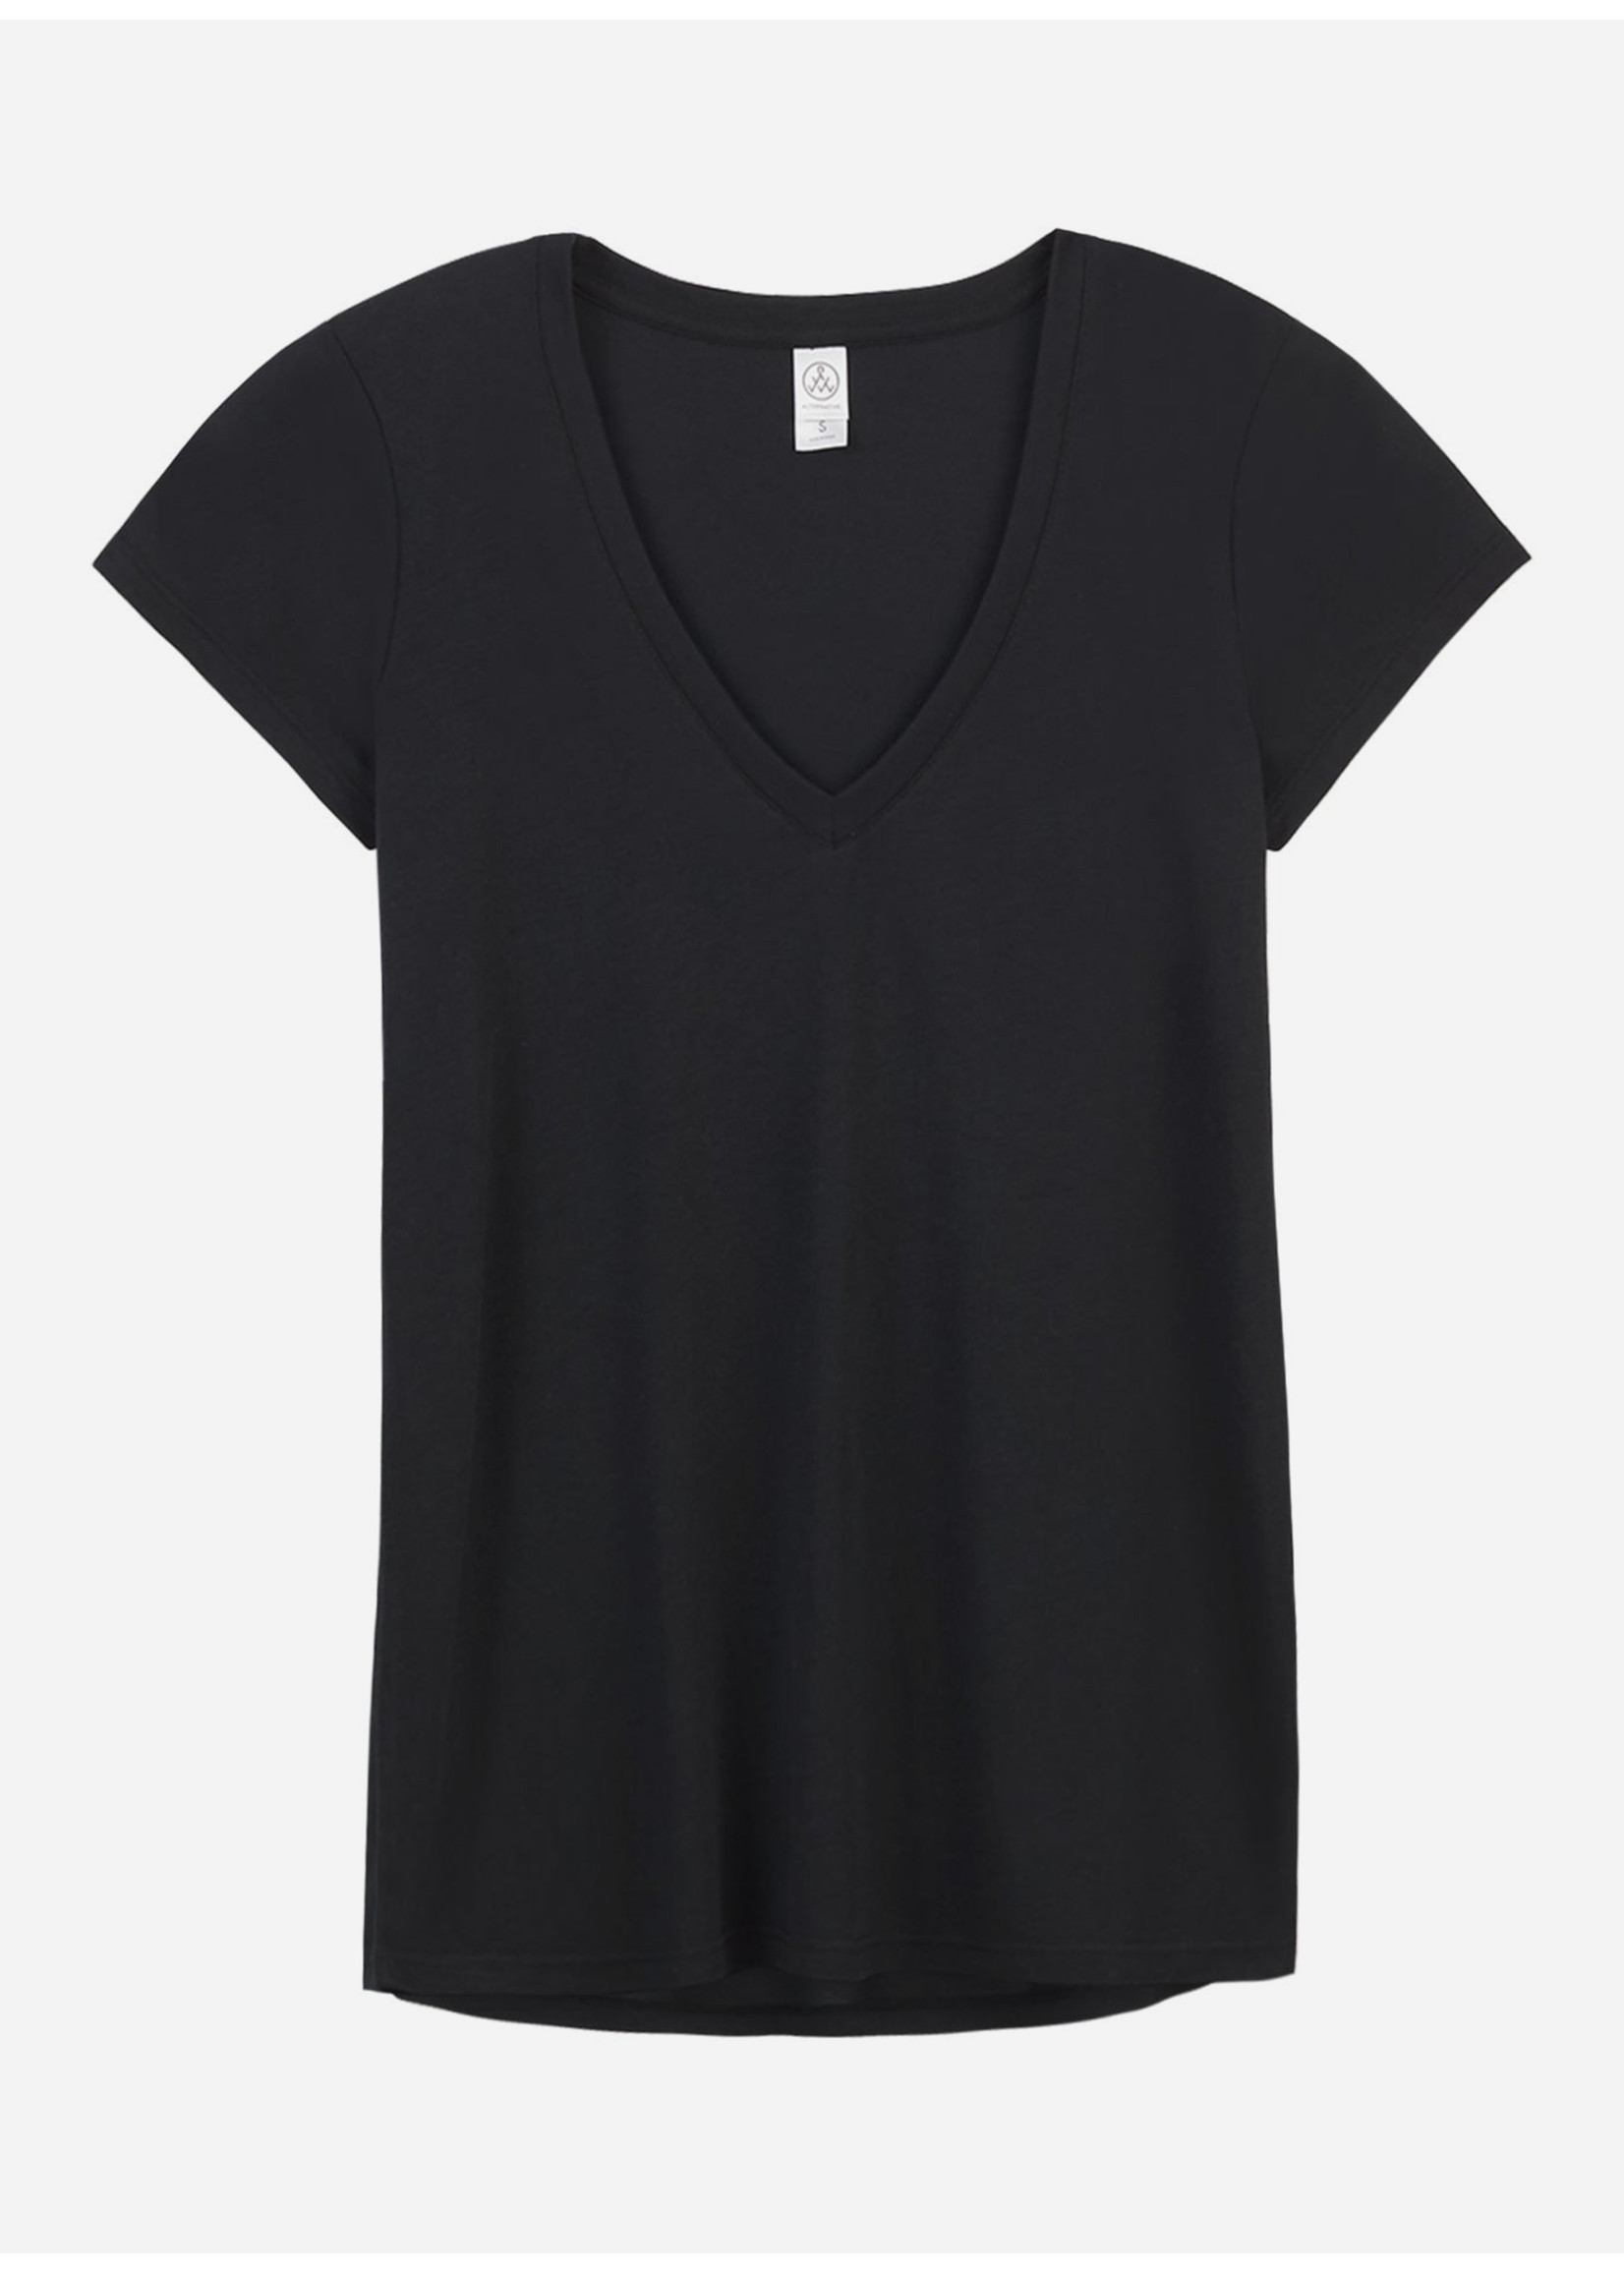 Alternative V-neck black